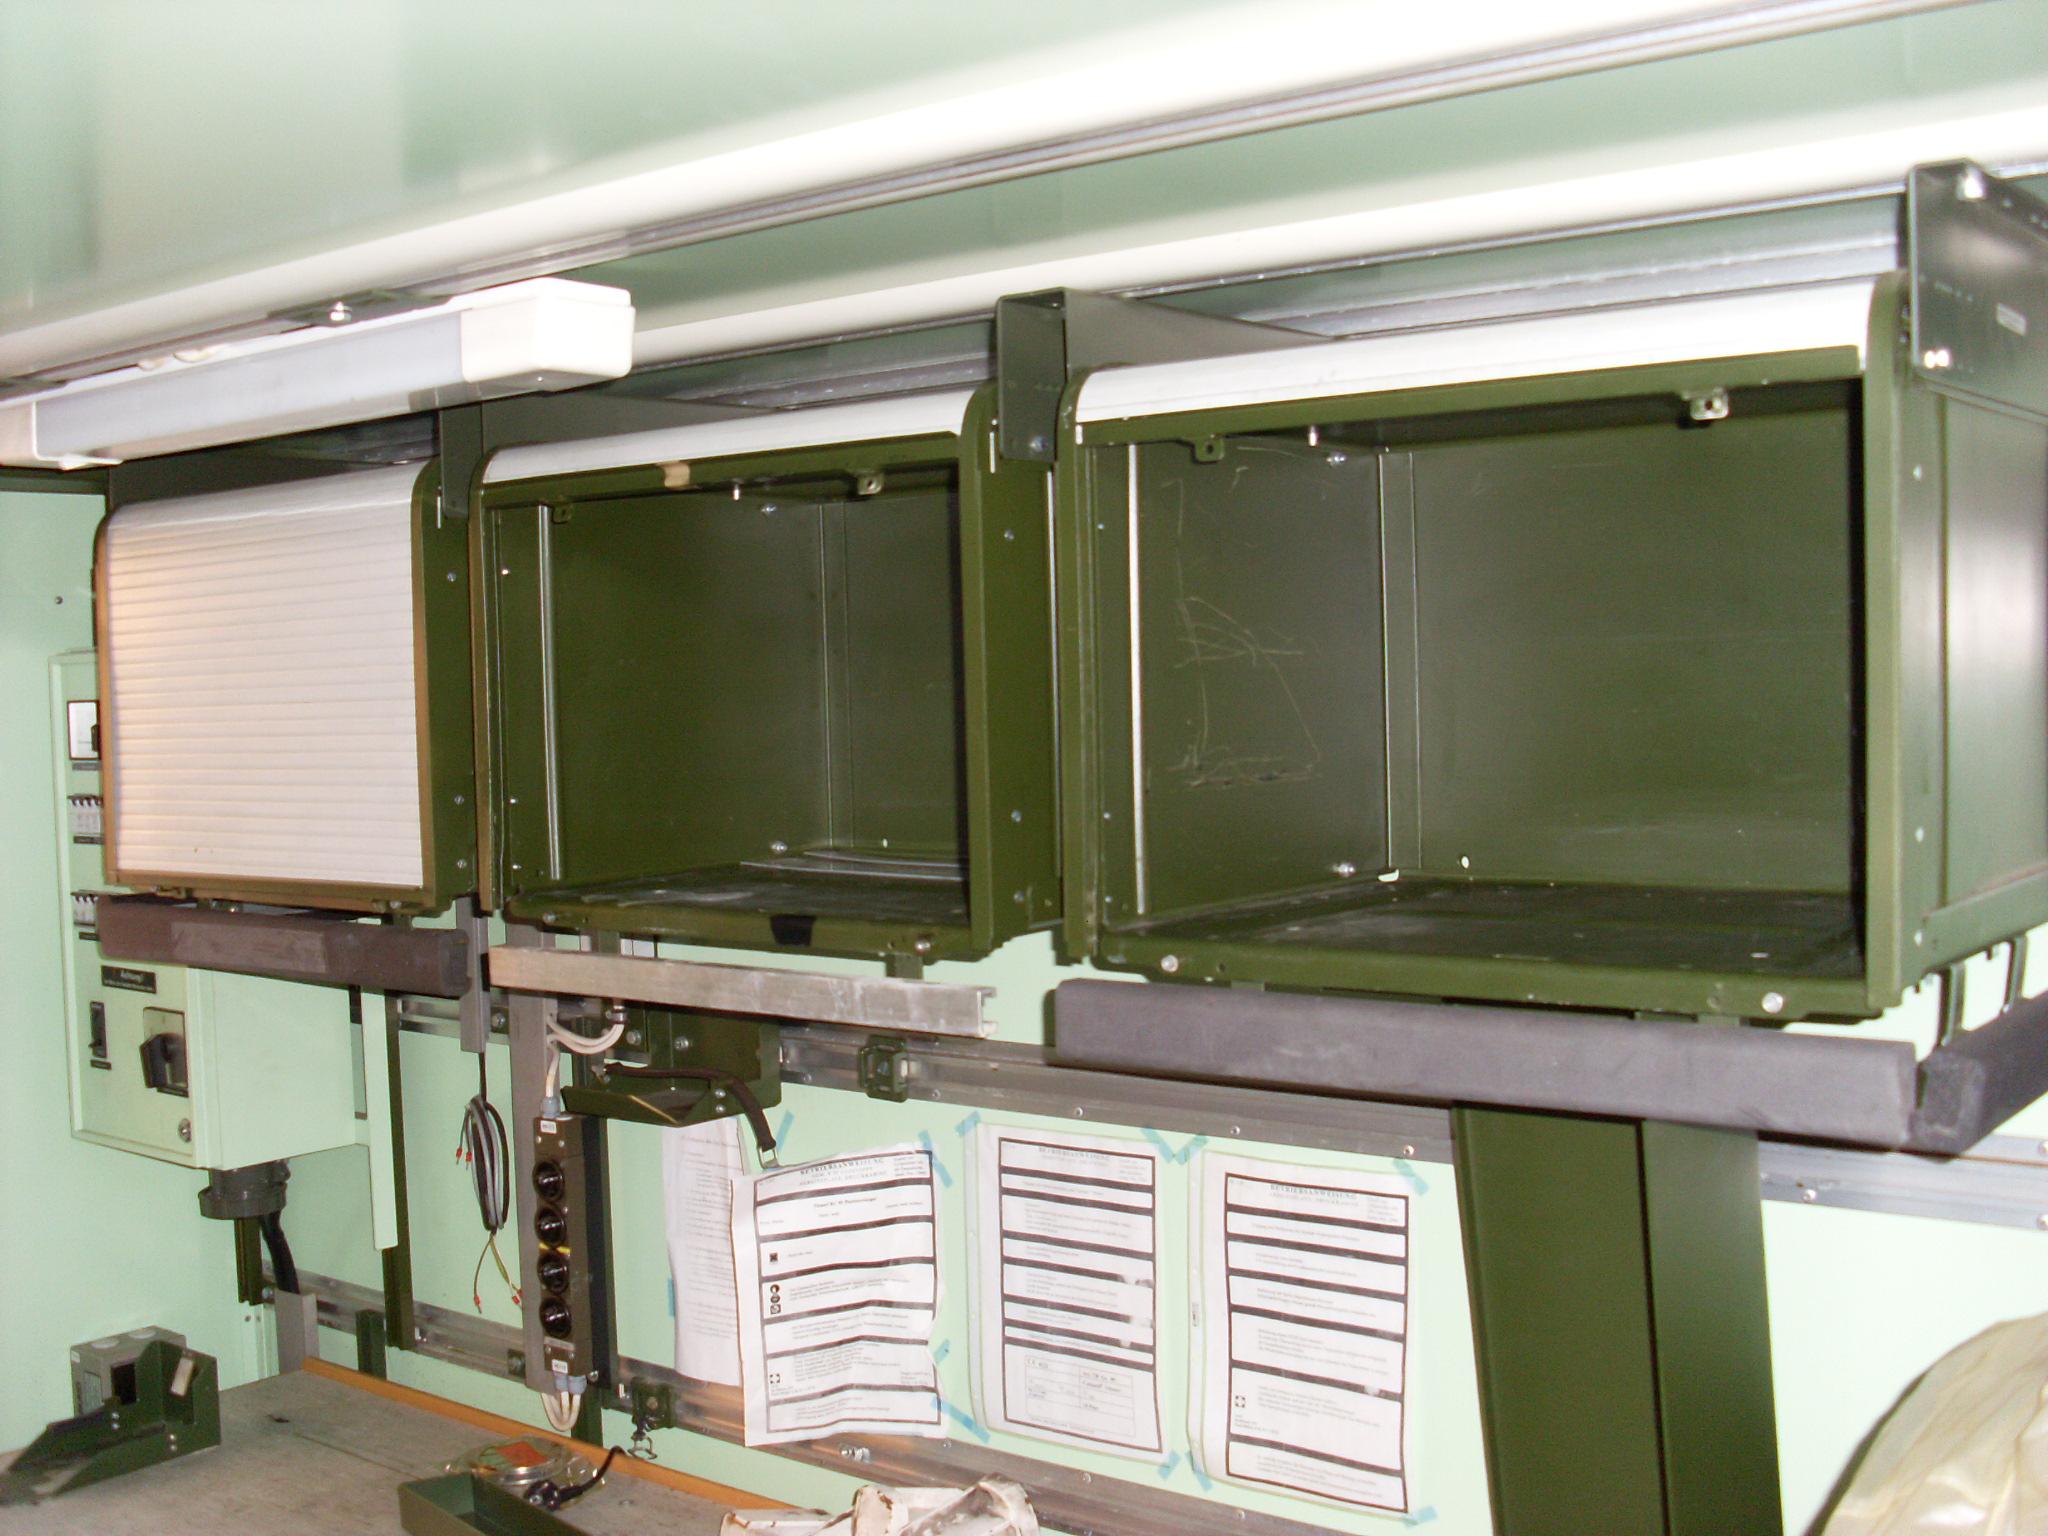 BW Roll Schrank neuwertig - Juwa - Militaria Outdoor Lagerverkauf